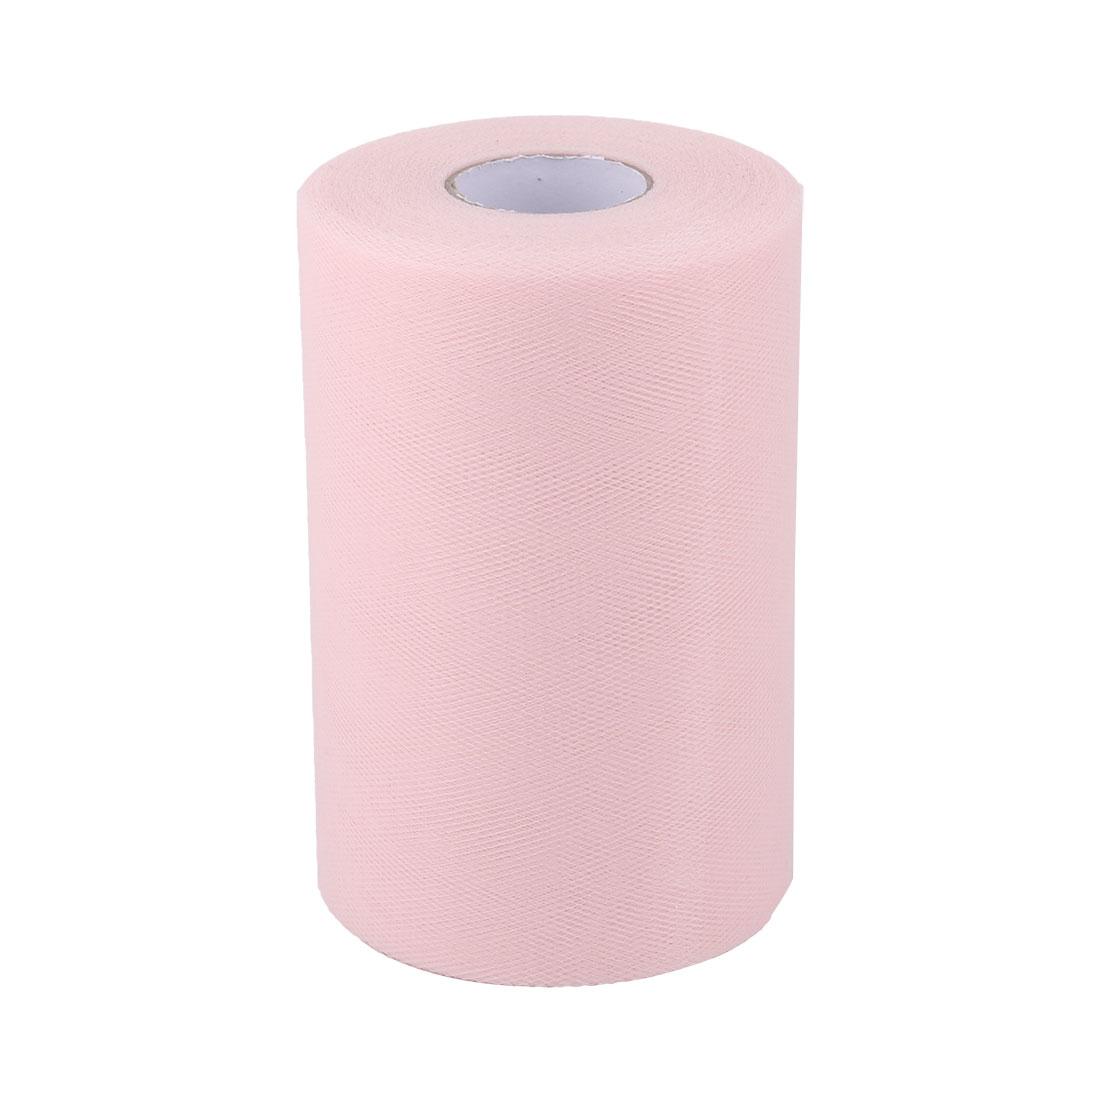 Shop Dress Tutu Gift Decor Tulle Spool Roll Light Pink 6 Inch x 100 Yards